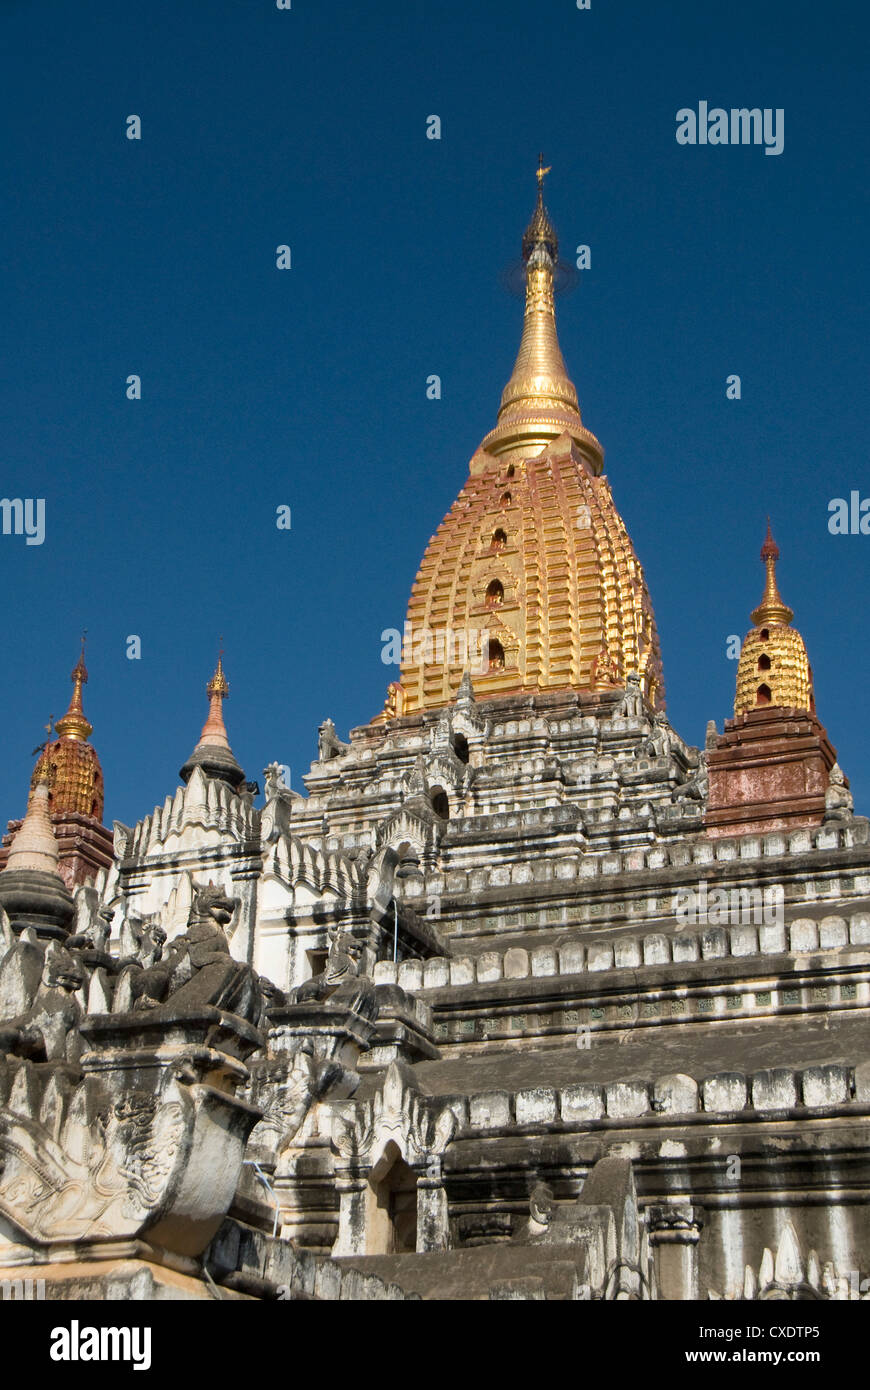 Ananda Pahto, Bagan (Pagan), Myanmar (Burma), Asia Stock Photo